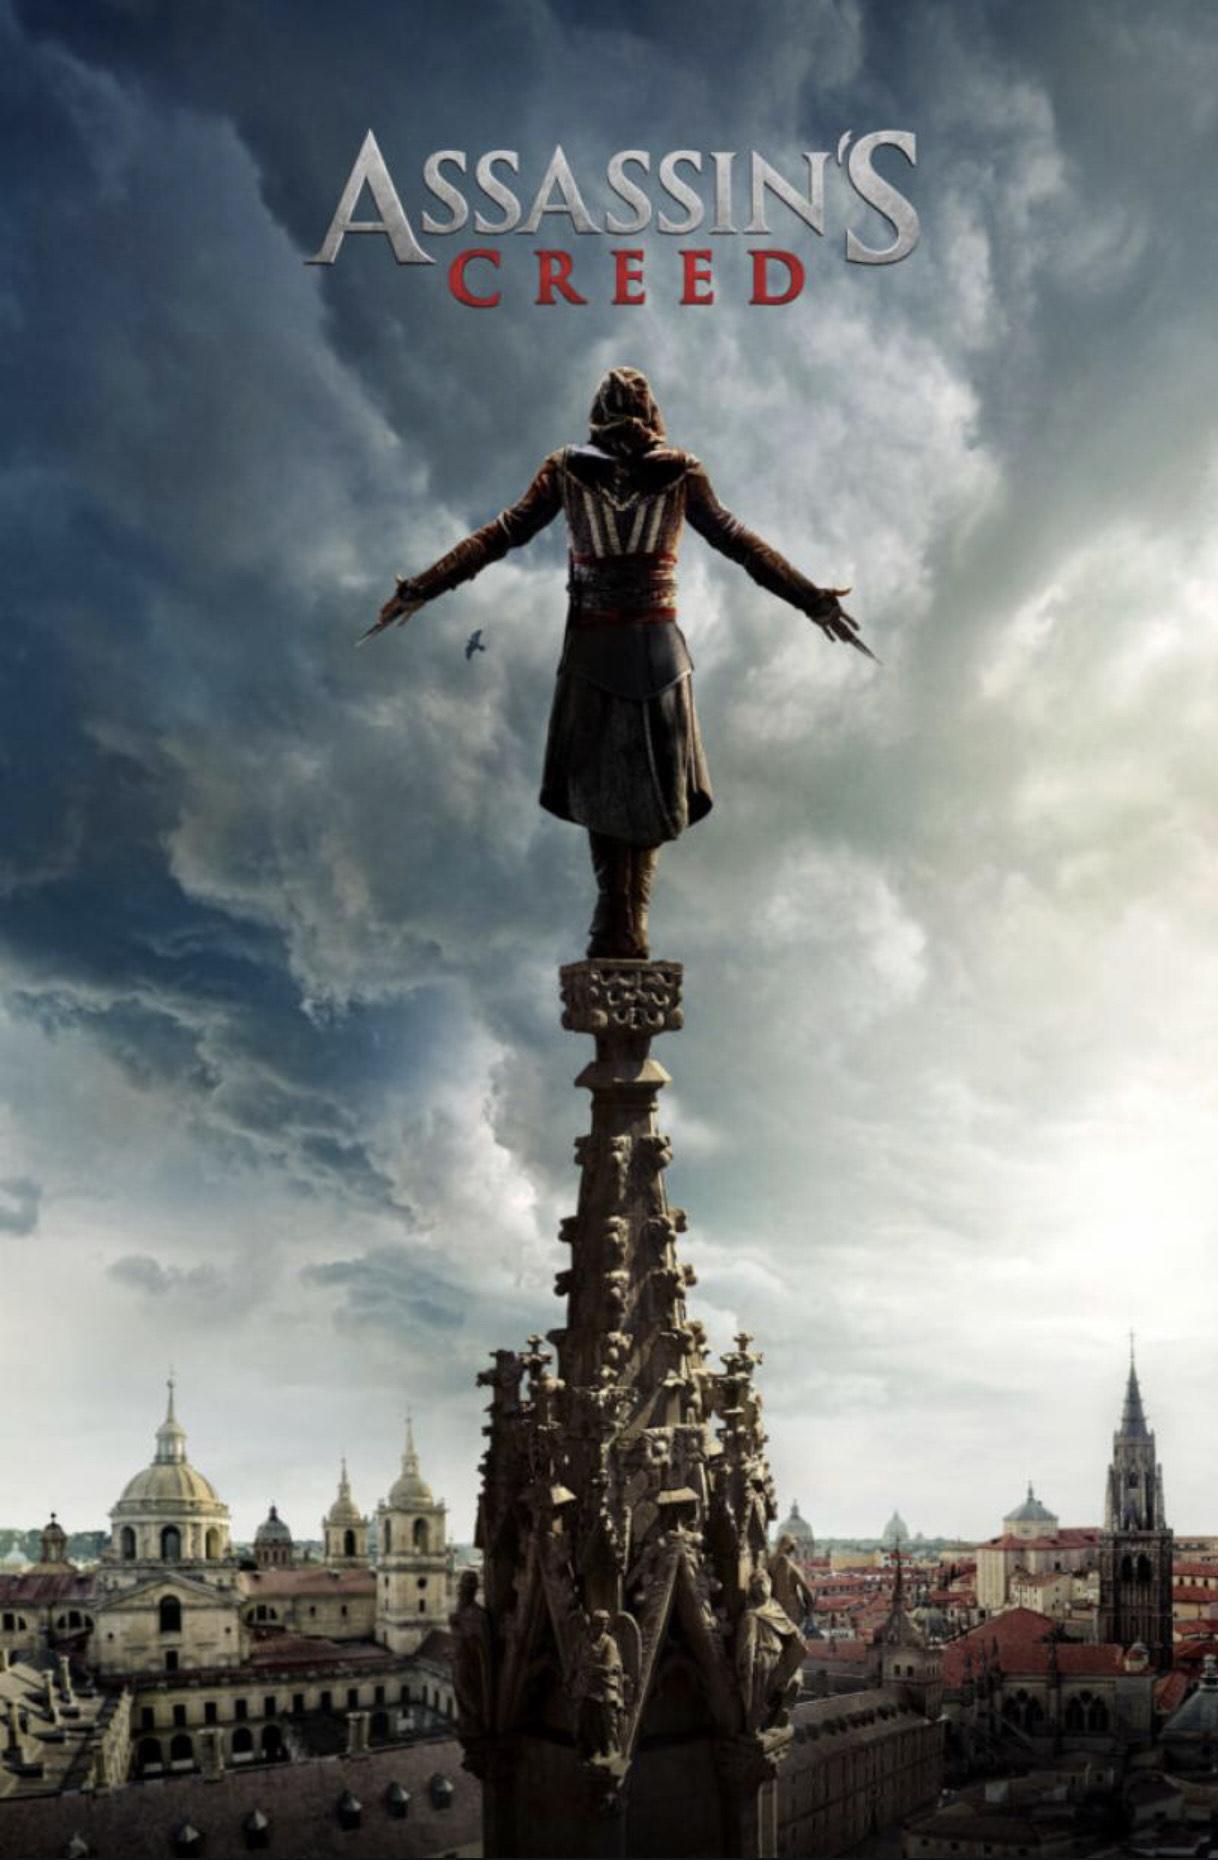 Assassins Creed 3D + Blu-Ray + Digital £2 @ Poundland